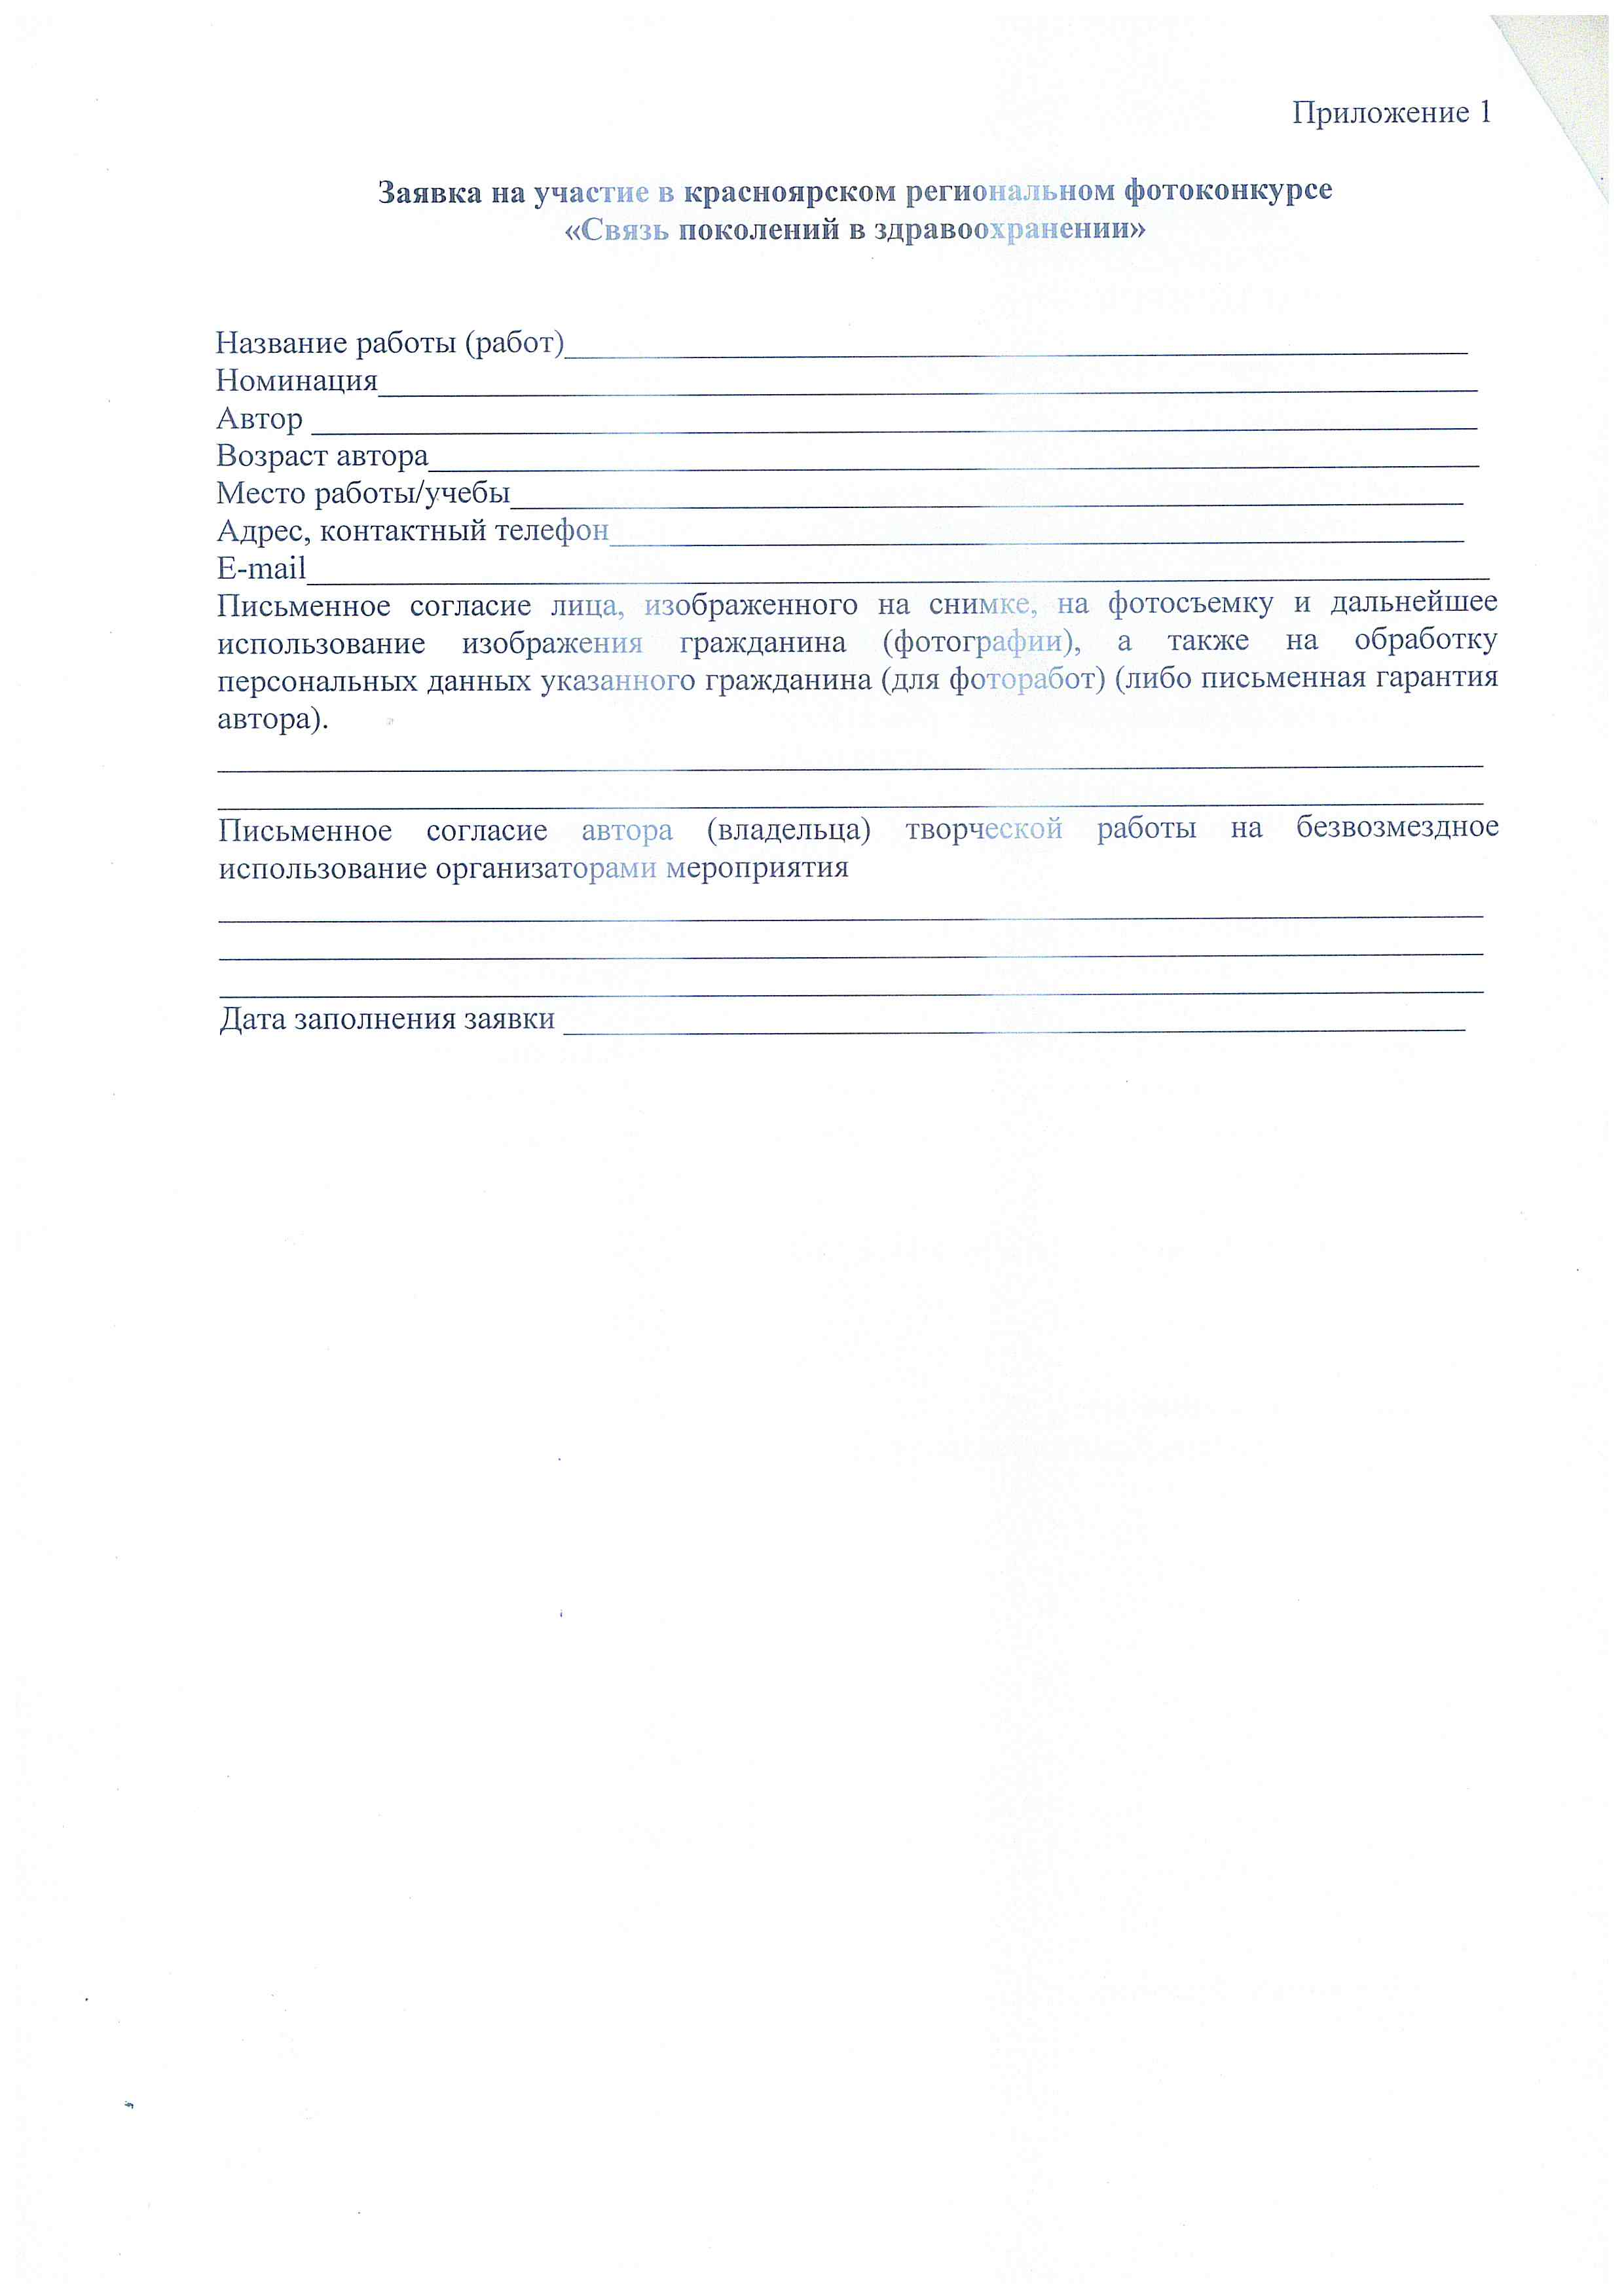 doc20190128093850_001